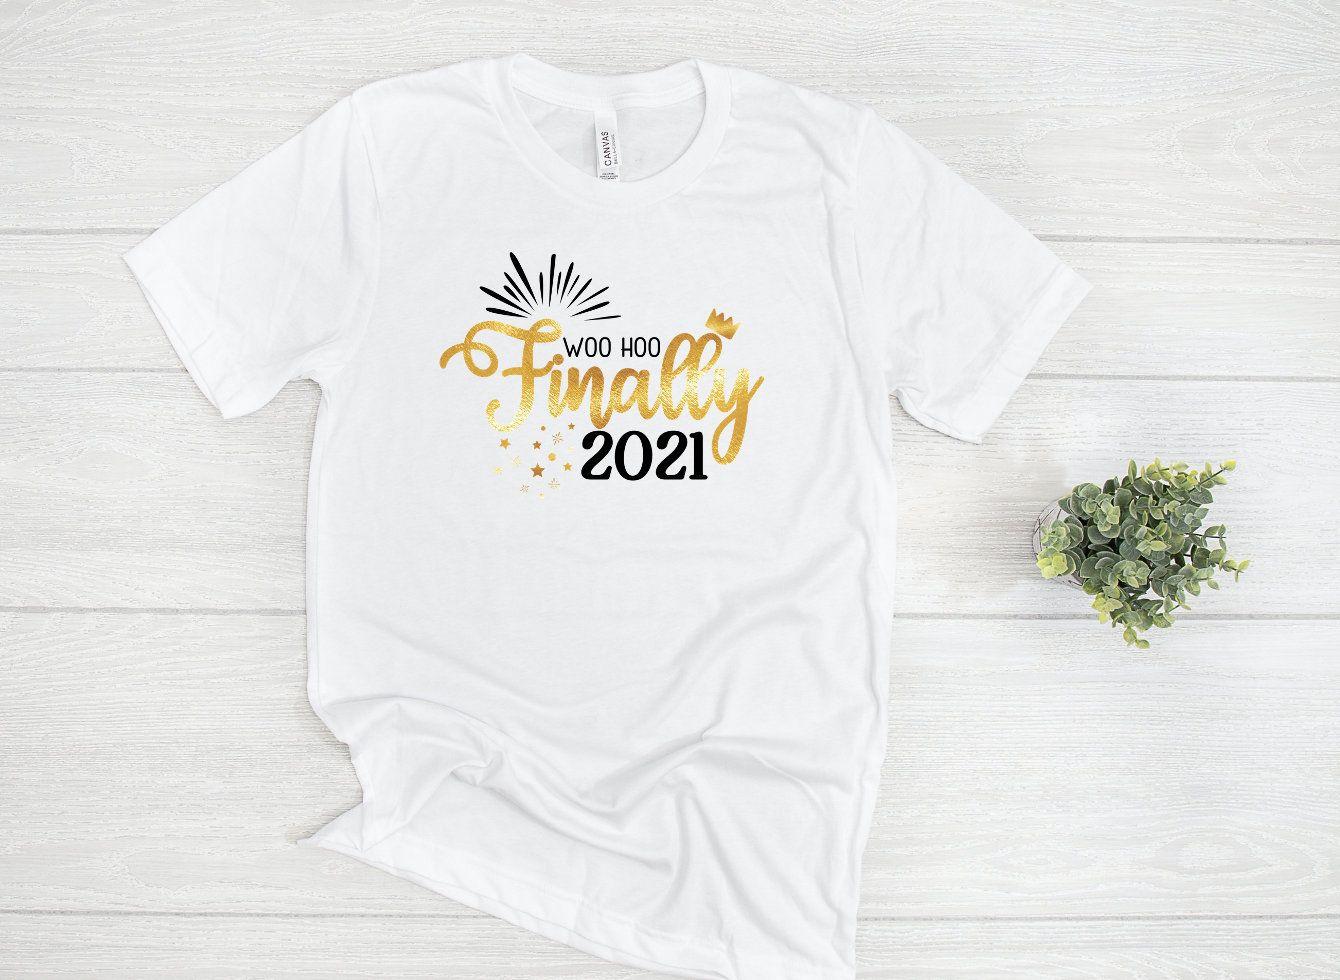 Happy New Year Shirt New Year Shirt New Years Eve Shirts Nye 2021 Shirts Hello 2021 Shirt Christma In 2020 New Years Eve Shirt New Years Shirts Dad And Son Shirts